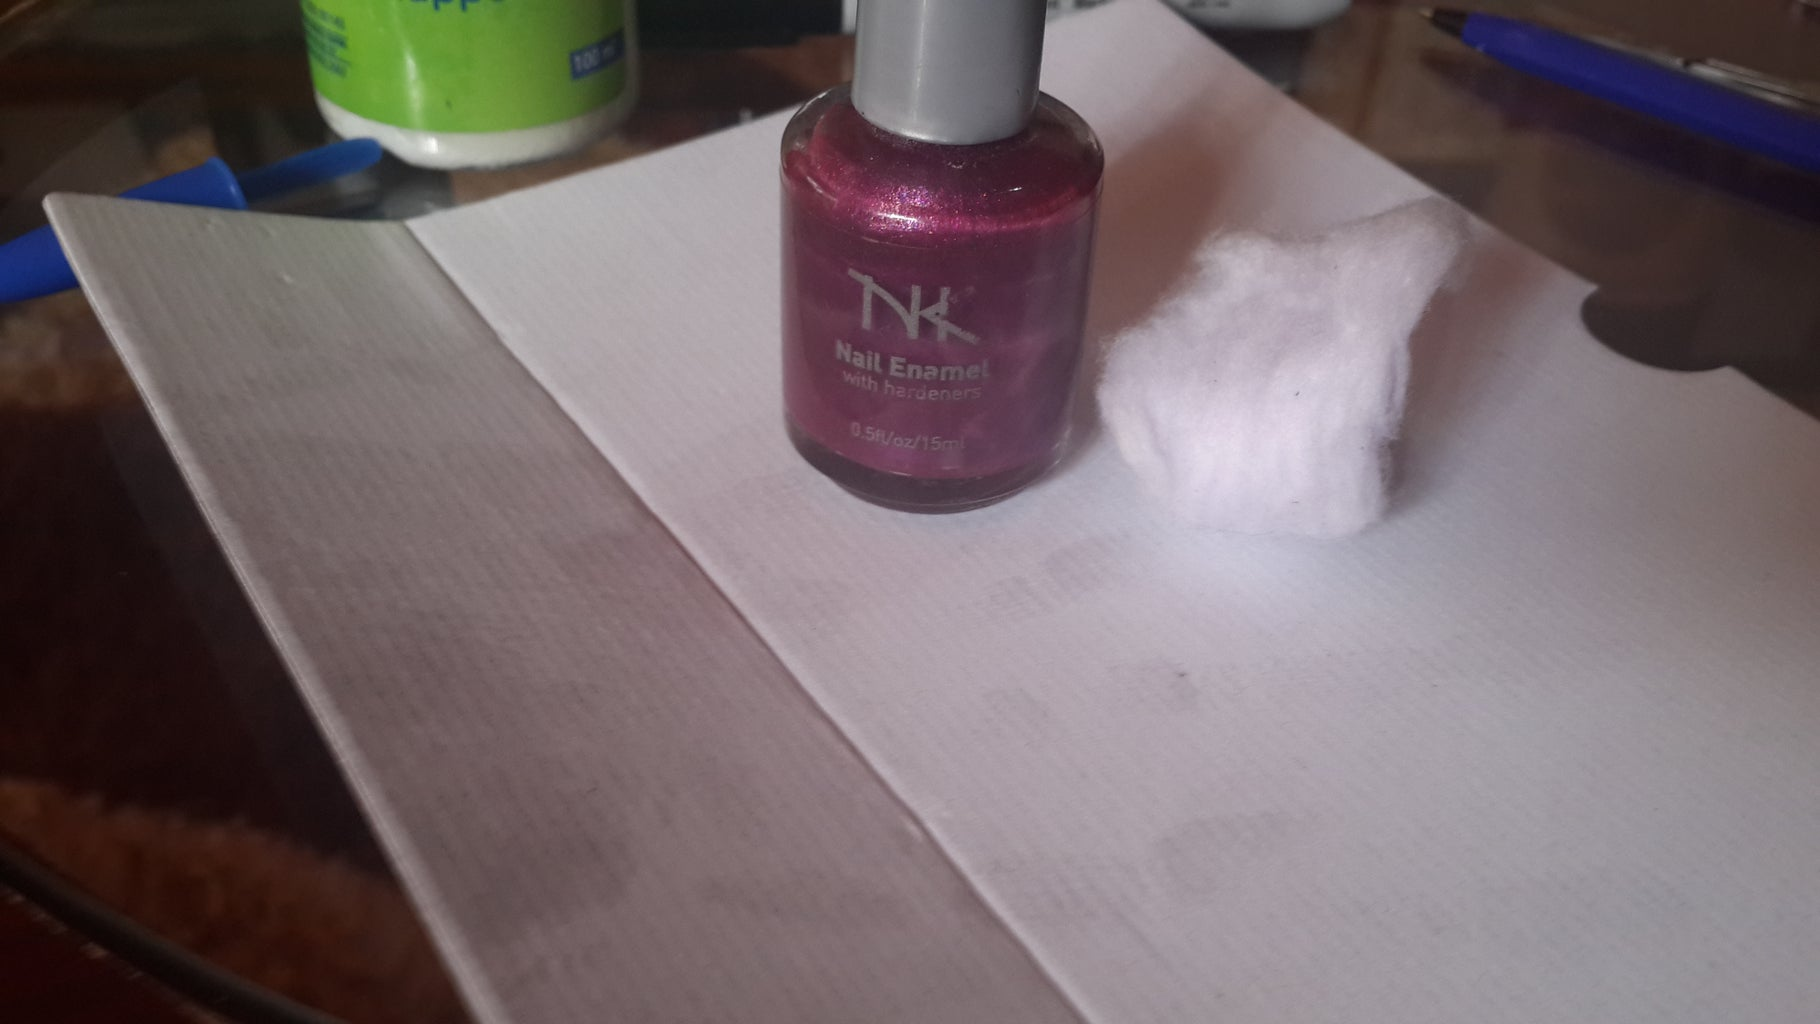 Dab Purple Nail Polish on Parts of Your Nails